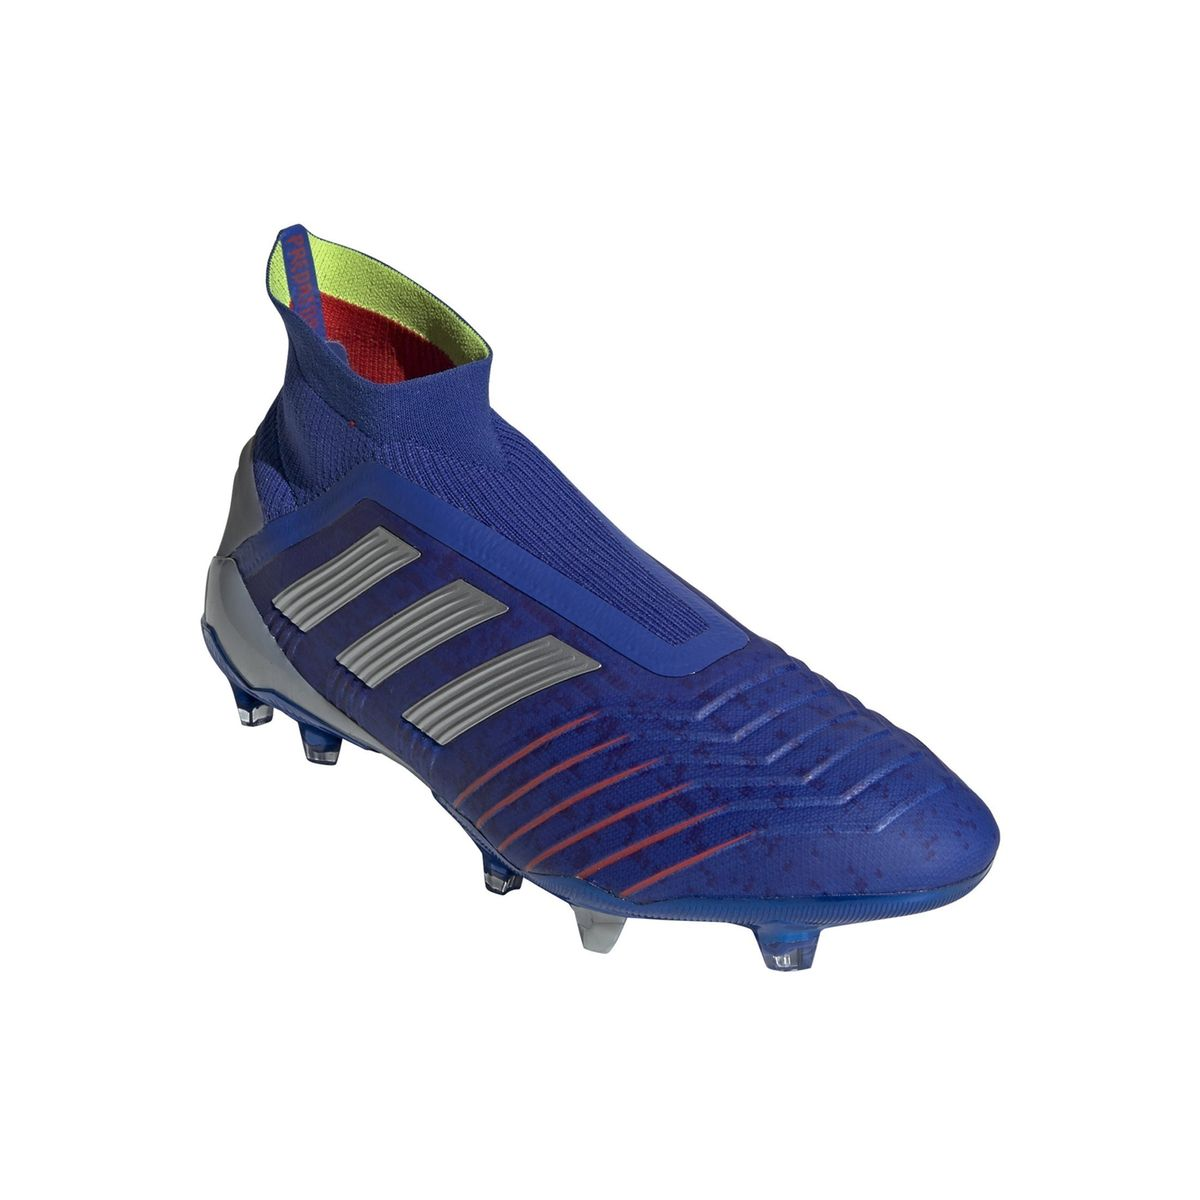 Predator 19Taille41 Football Football Chaussures 13;42Products 19Taille41 Football Chaussures Predator 13;42Products Chaussures stCxBoQrdh